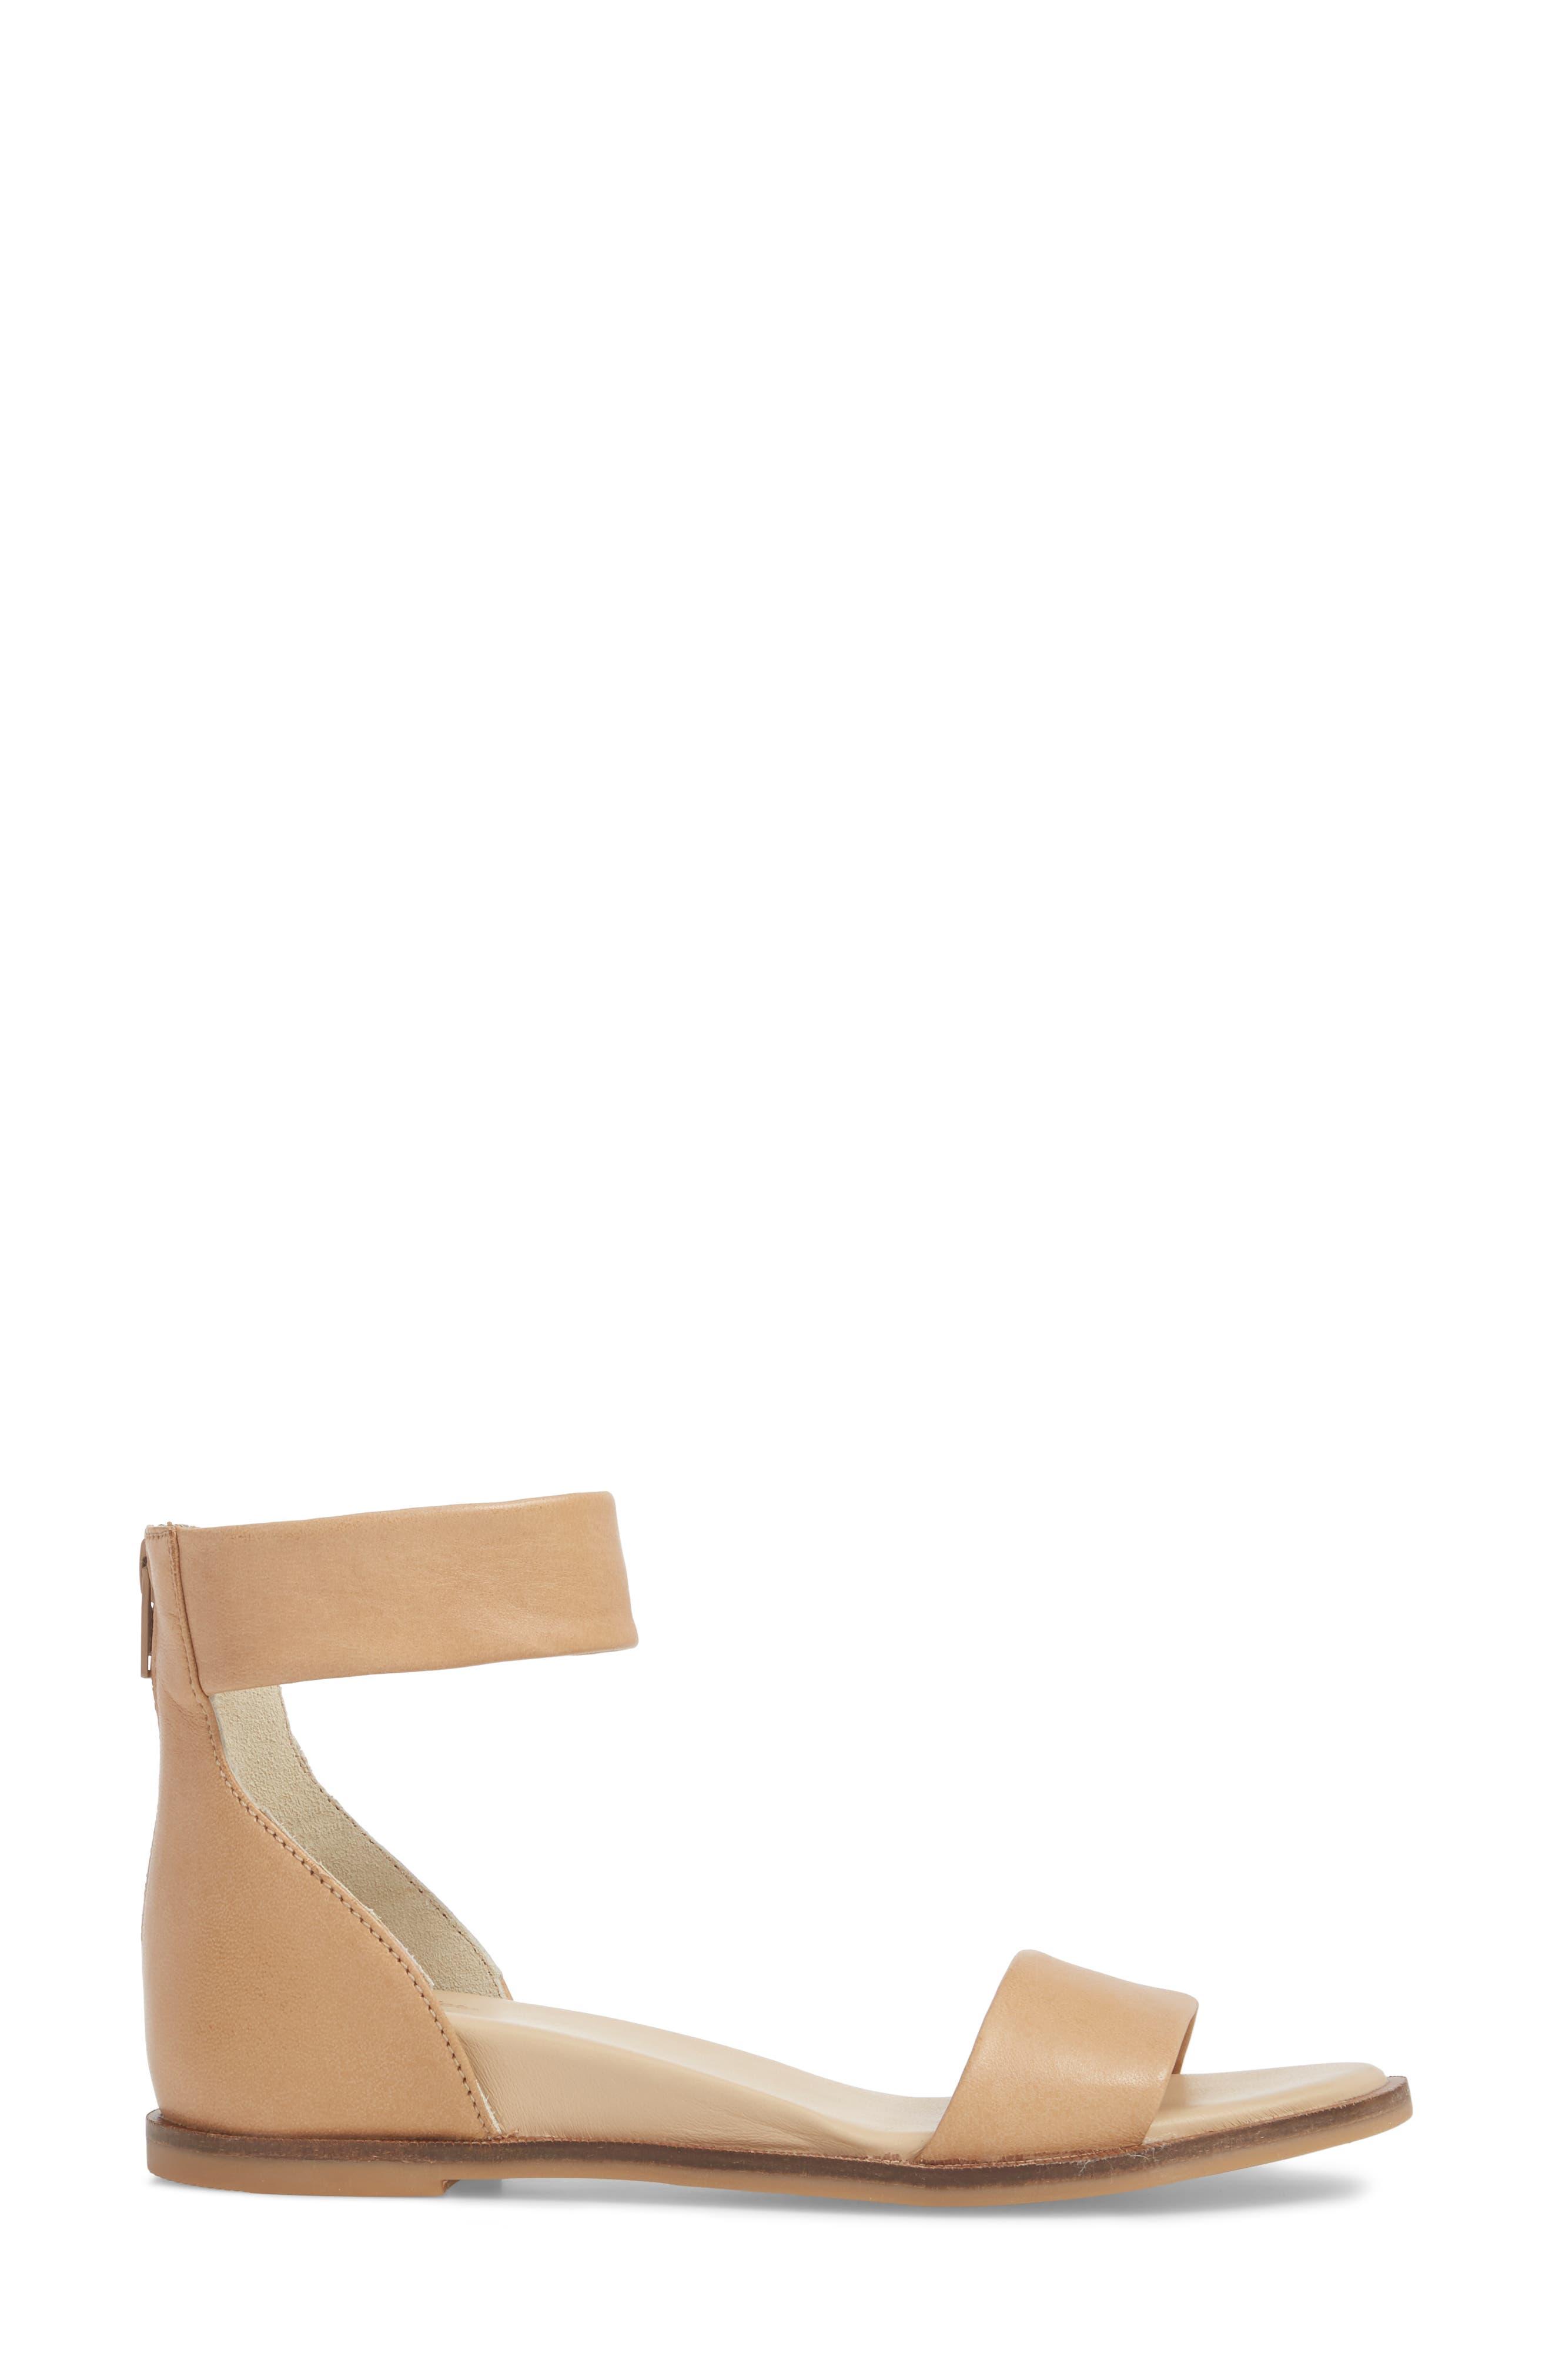 Ankle Strap Sandal,                             Alternate thumbnail 3, color,                             VACCHETTA LEATHER